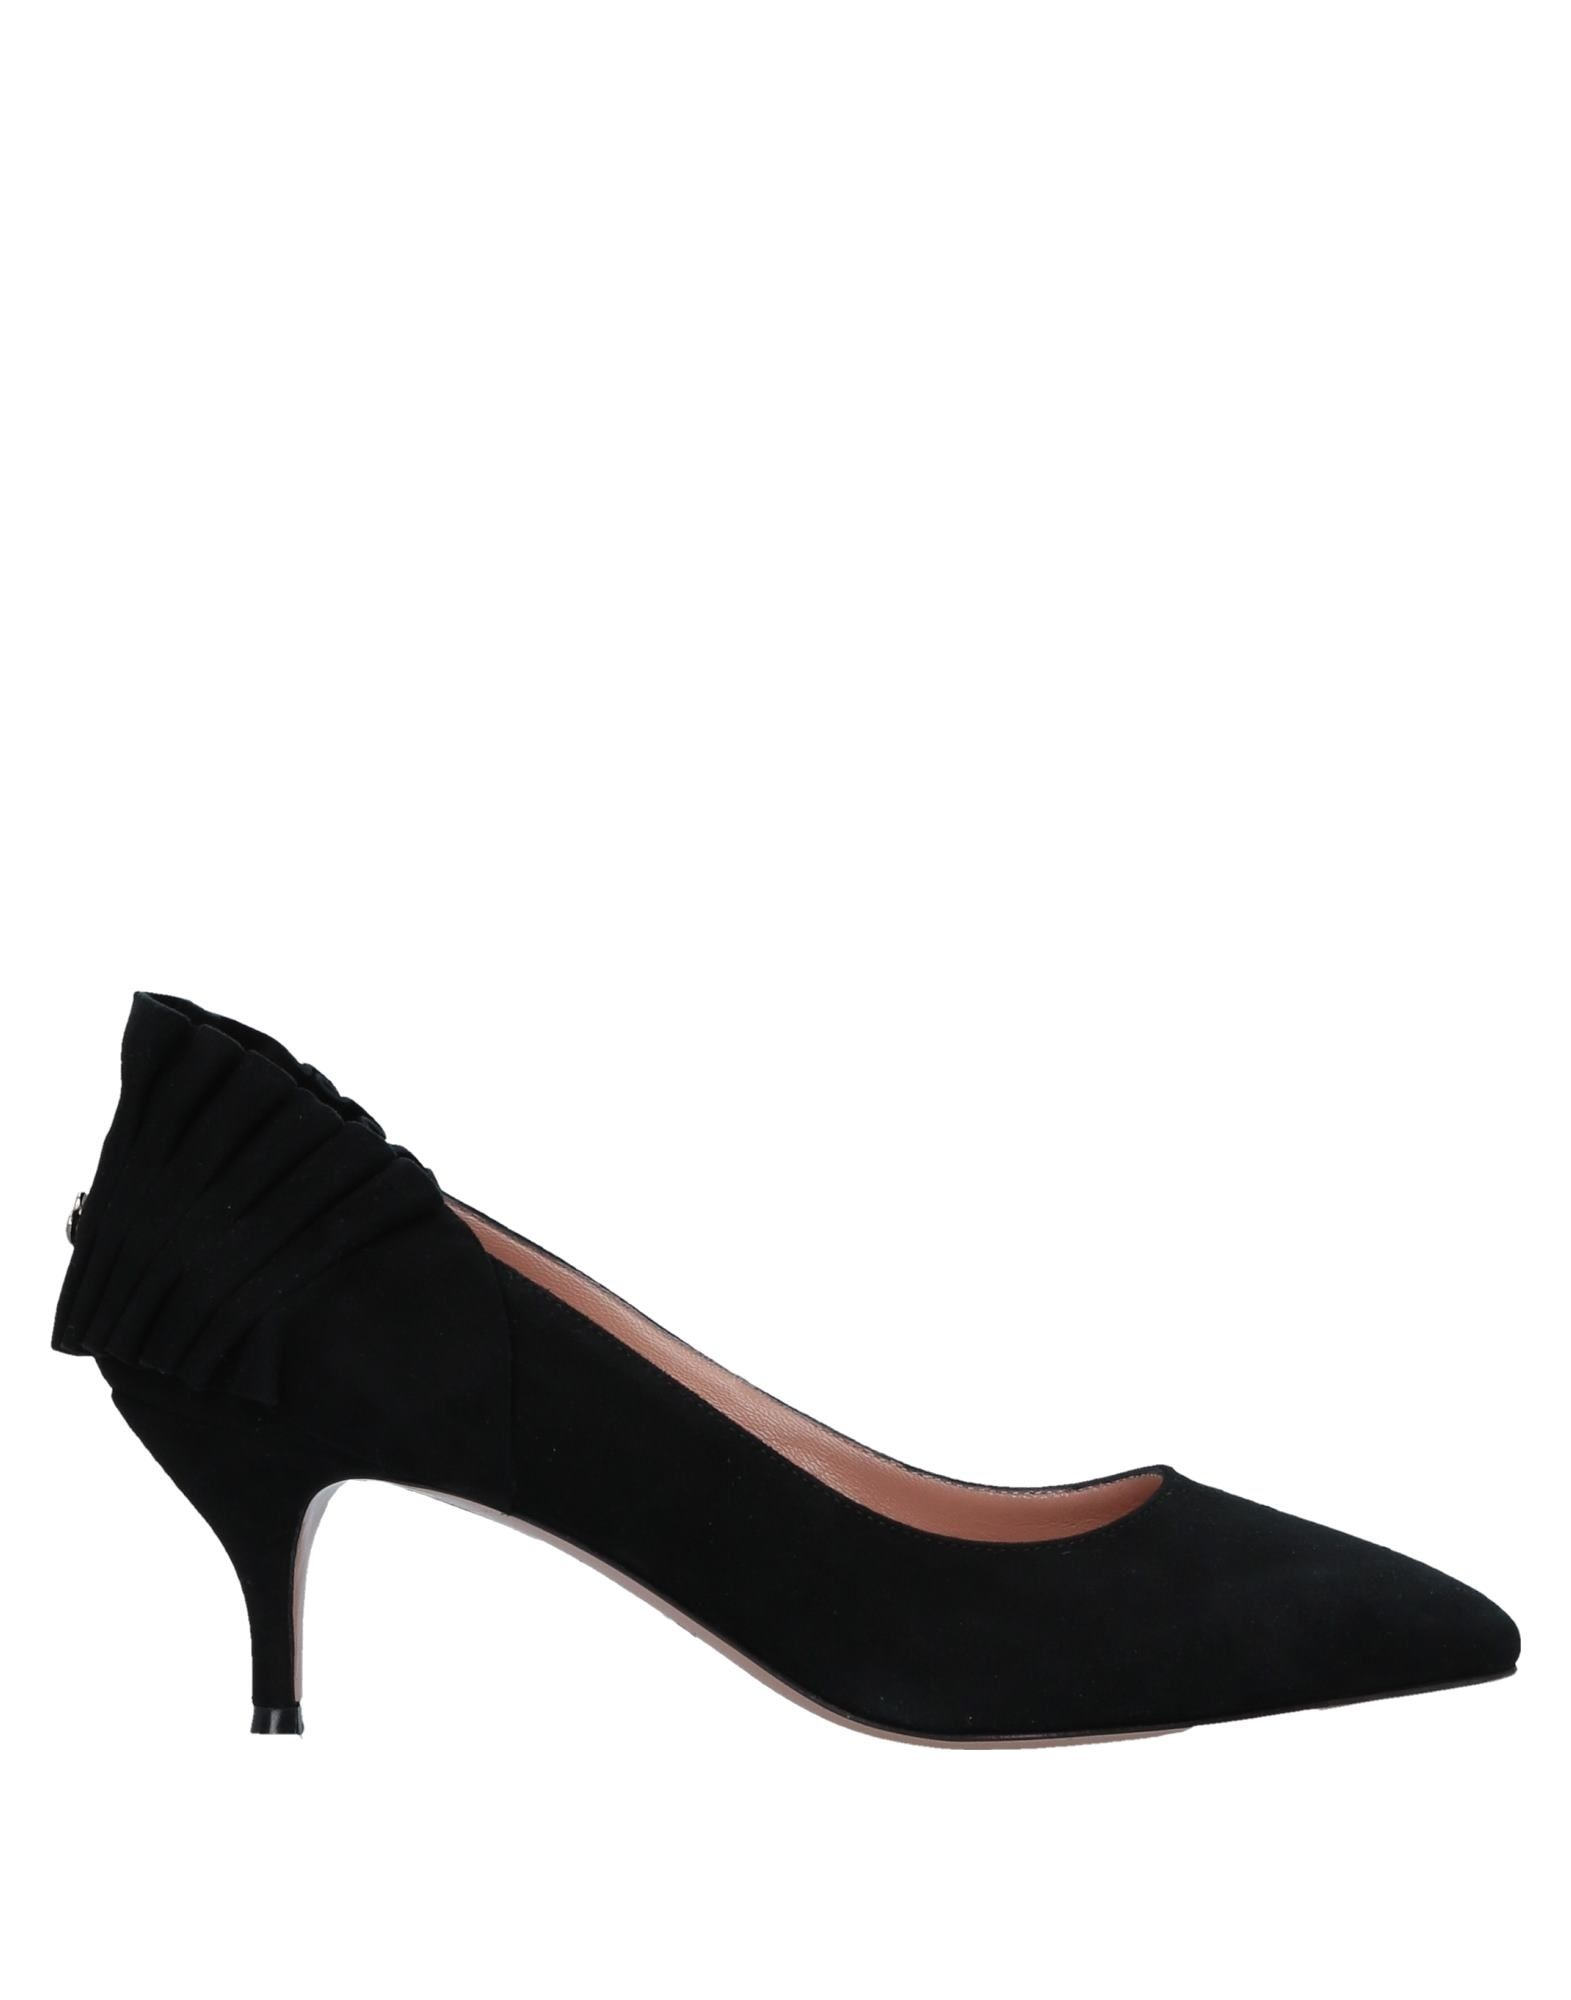 Haltbare Mode billige Schuhe Twin Schuhe 11529675QF Beliebte Schuhe Twin d04310